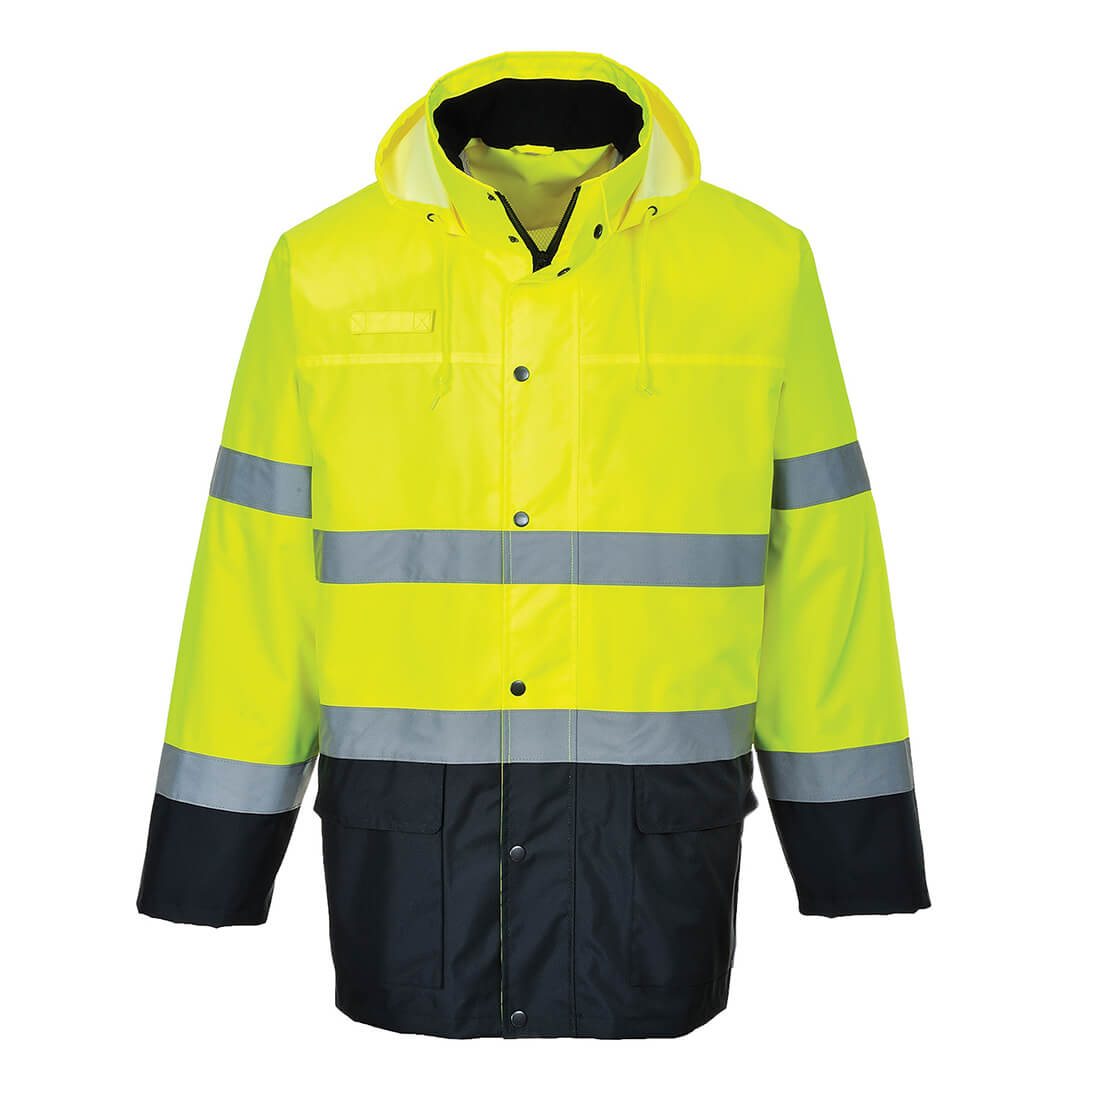 Image of Oxford Weave 150D Class 3 Lite Hi Vis 2-Tone Traffic Jacket Yellow / Navy 2XL